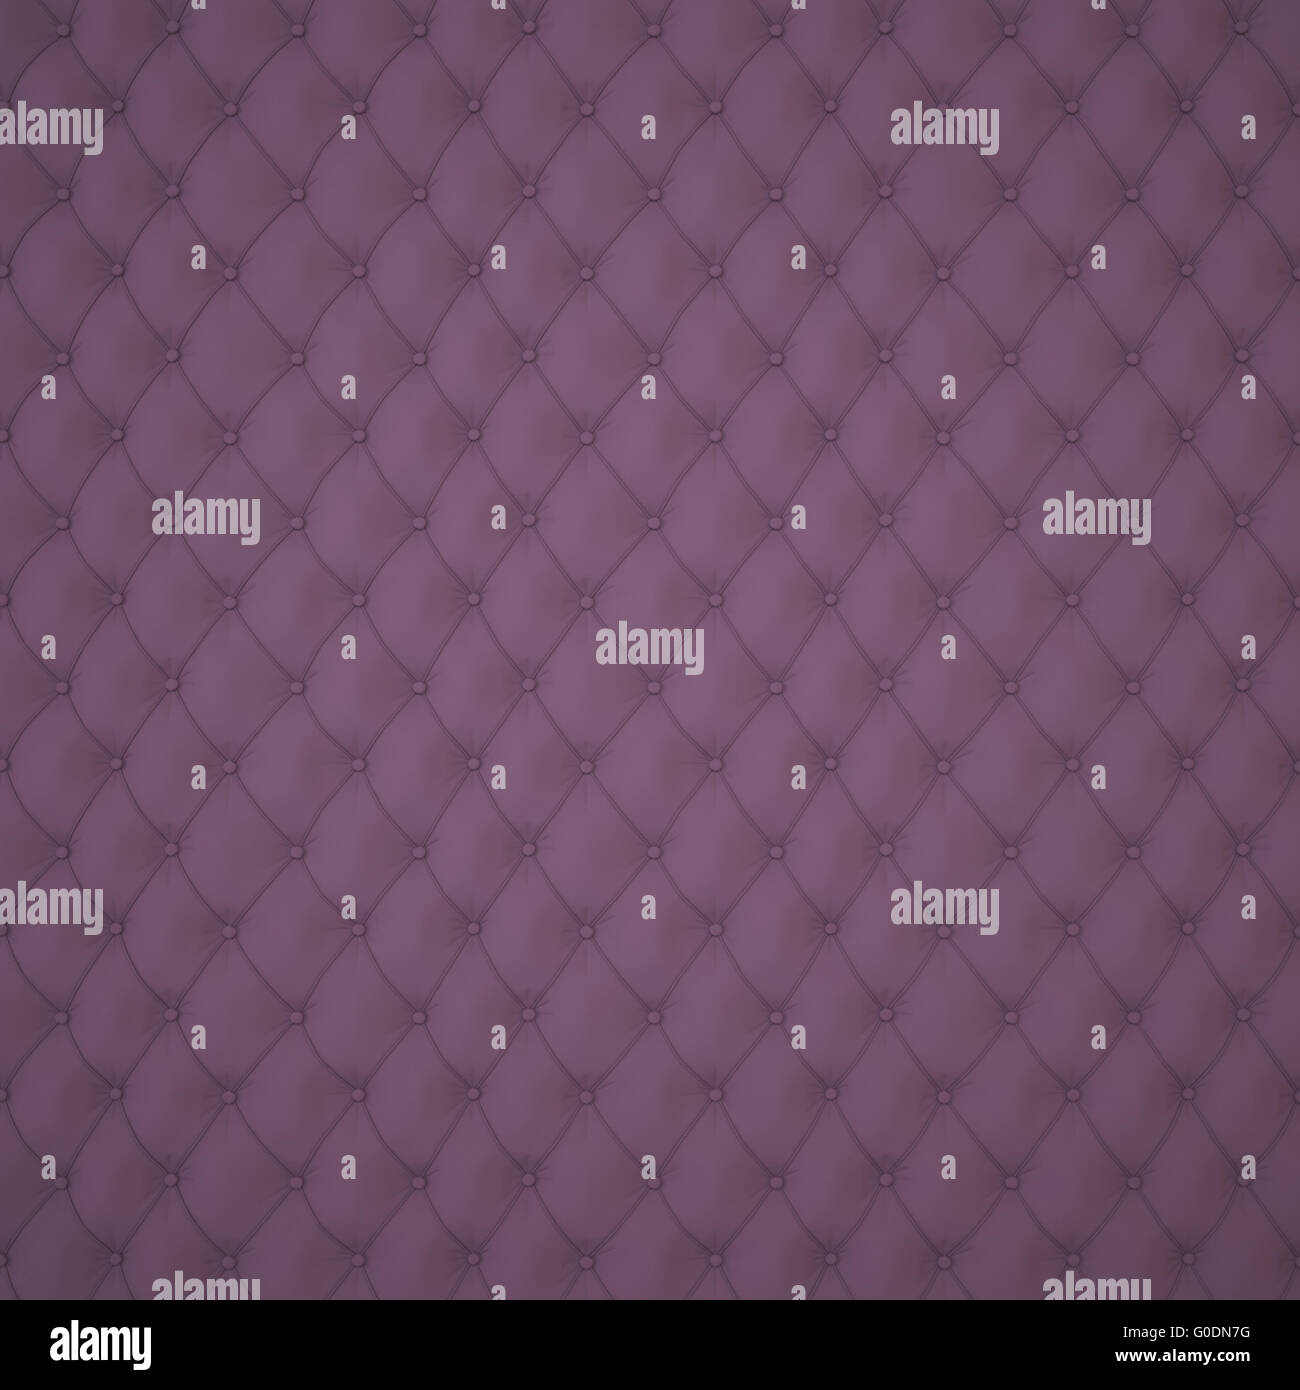 Dark Capitone Upholstery Pattern - Stock Image